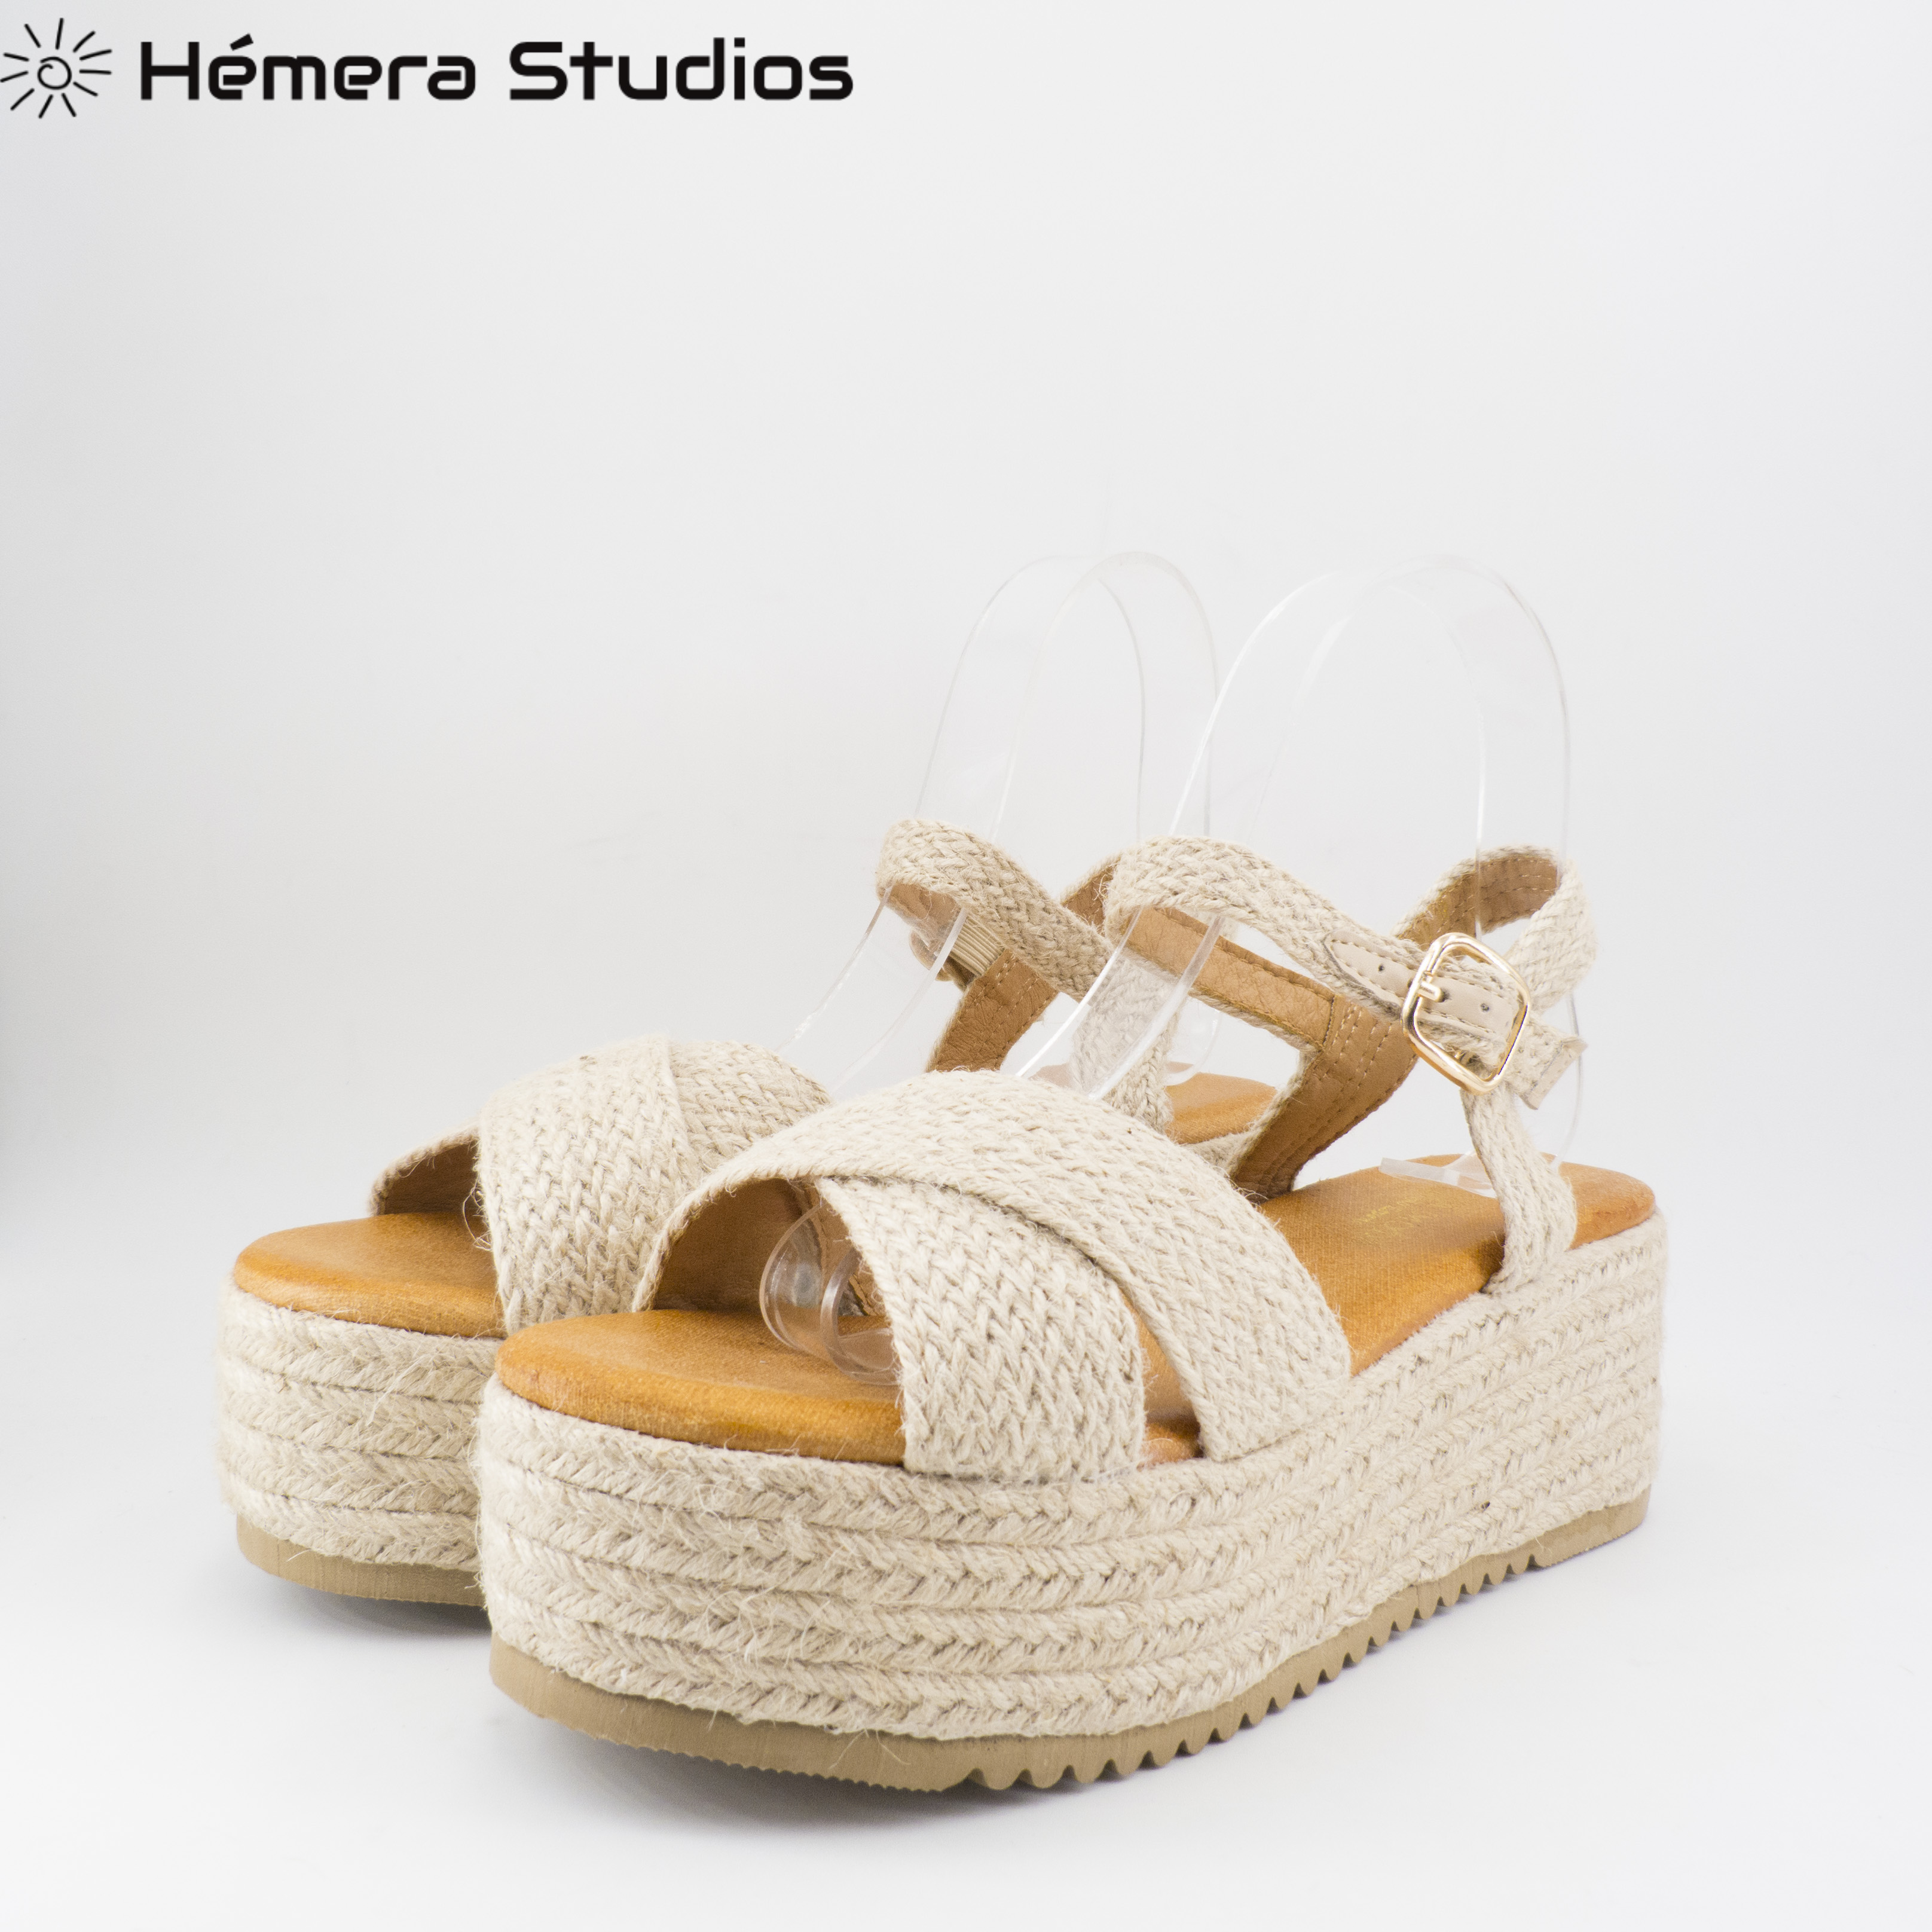 Gladiator Sandals Summer Woman Wedge 2020 Women's Shoes High Heel Platform In Beige Black Comfortable Breathable Smart Casual Beach